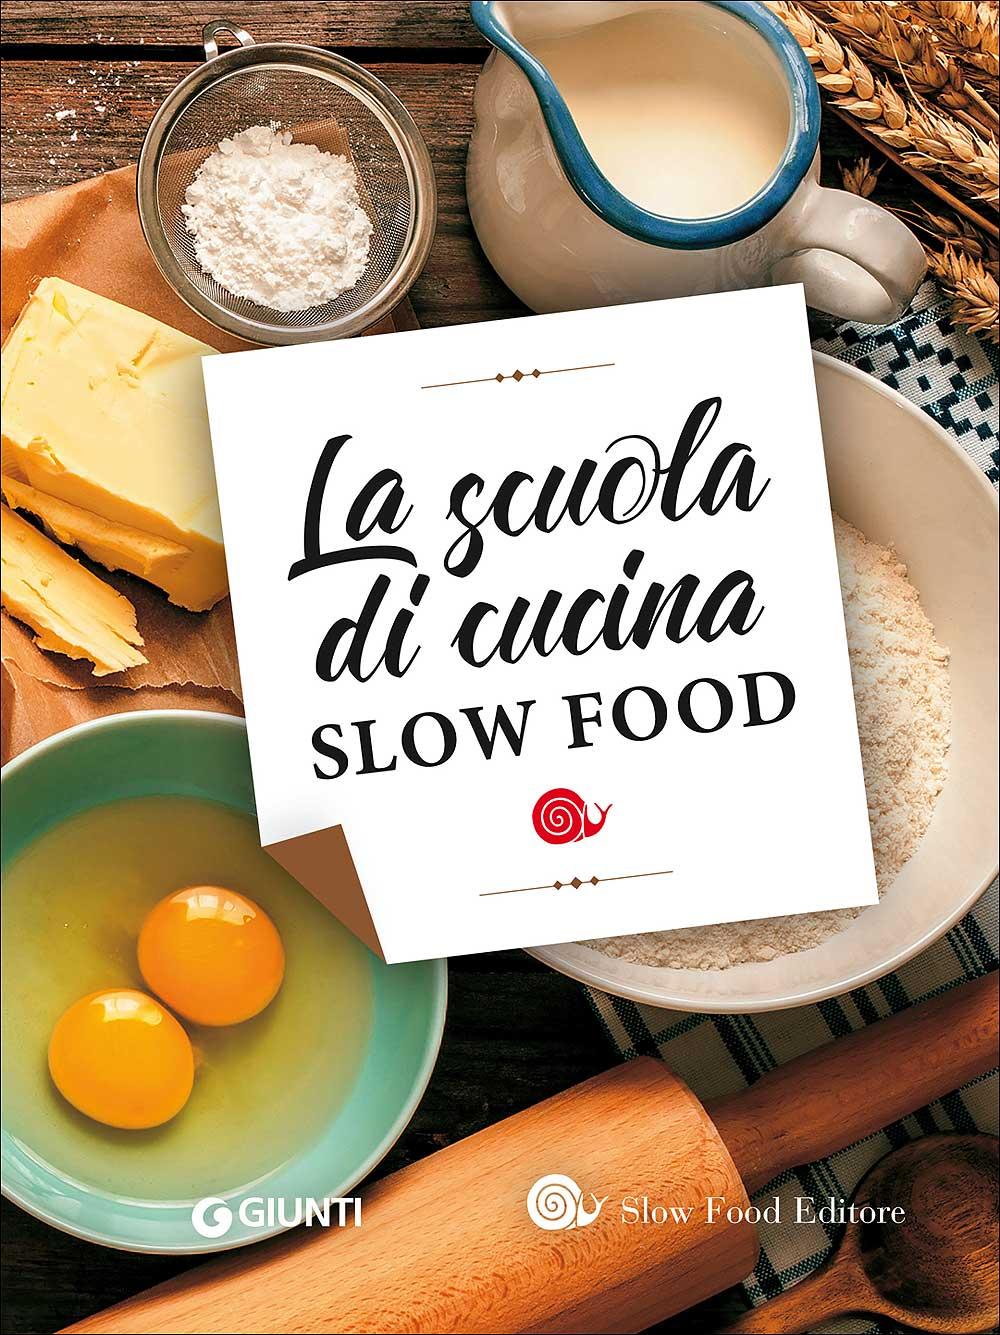 La Scuola di cucina Slow Food